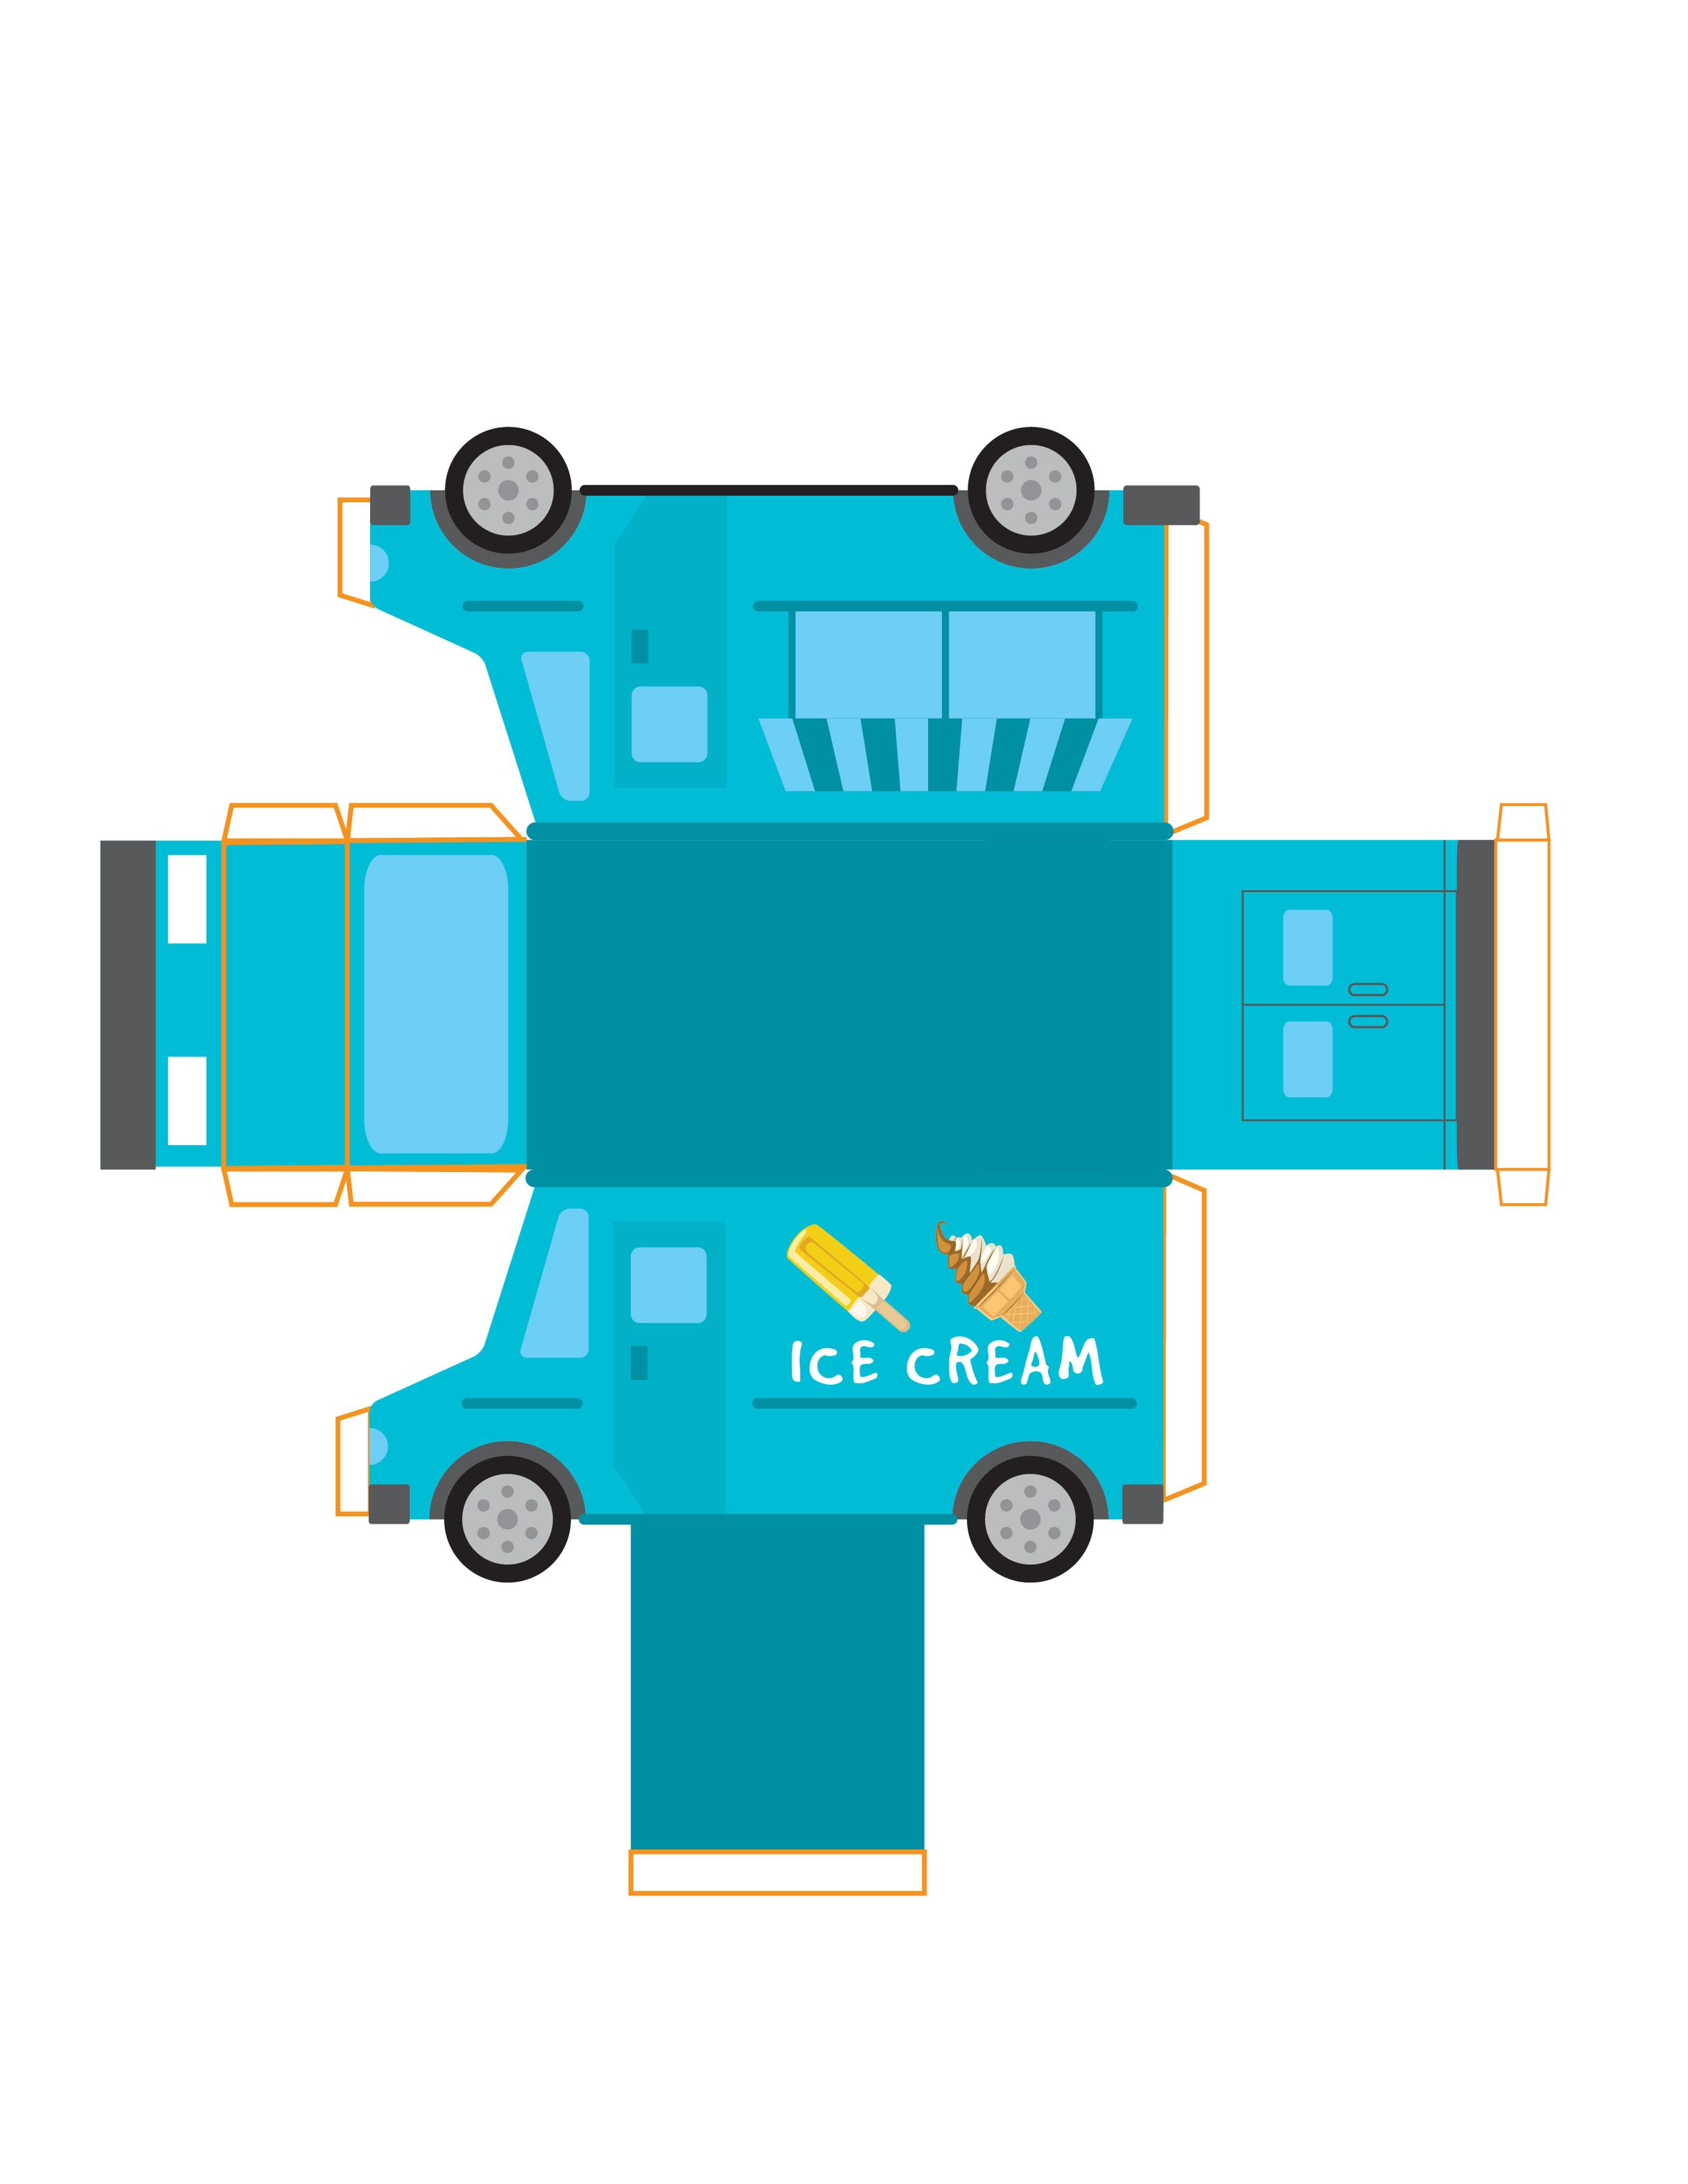 Food Truck Print Outs-03.jpg